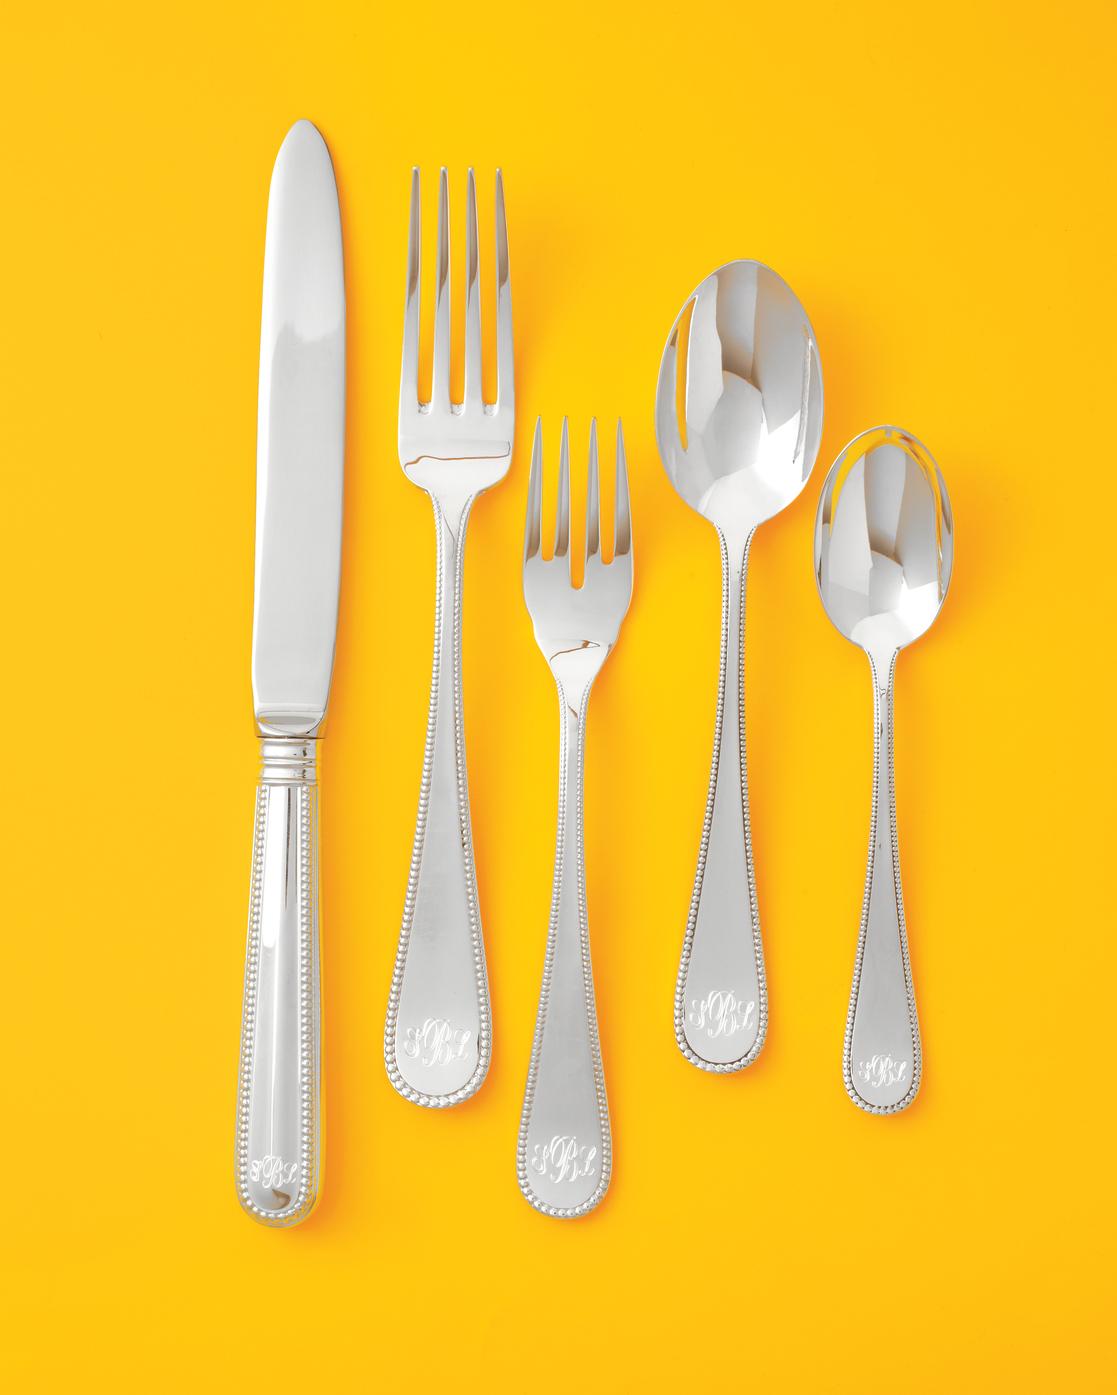 silverware-mwd108538.jpg